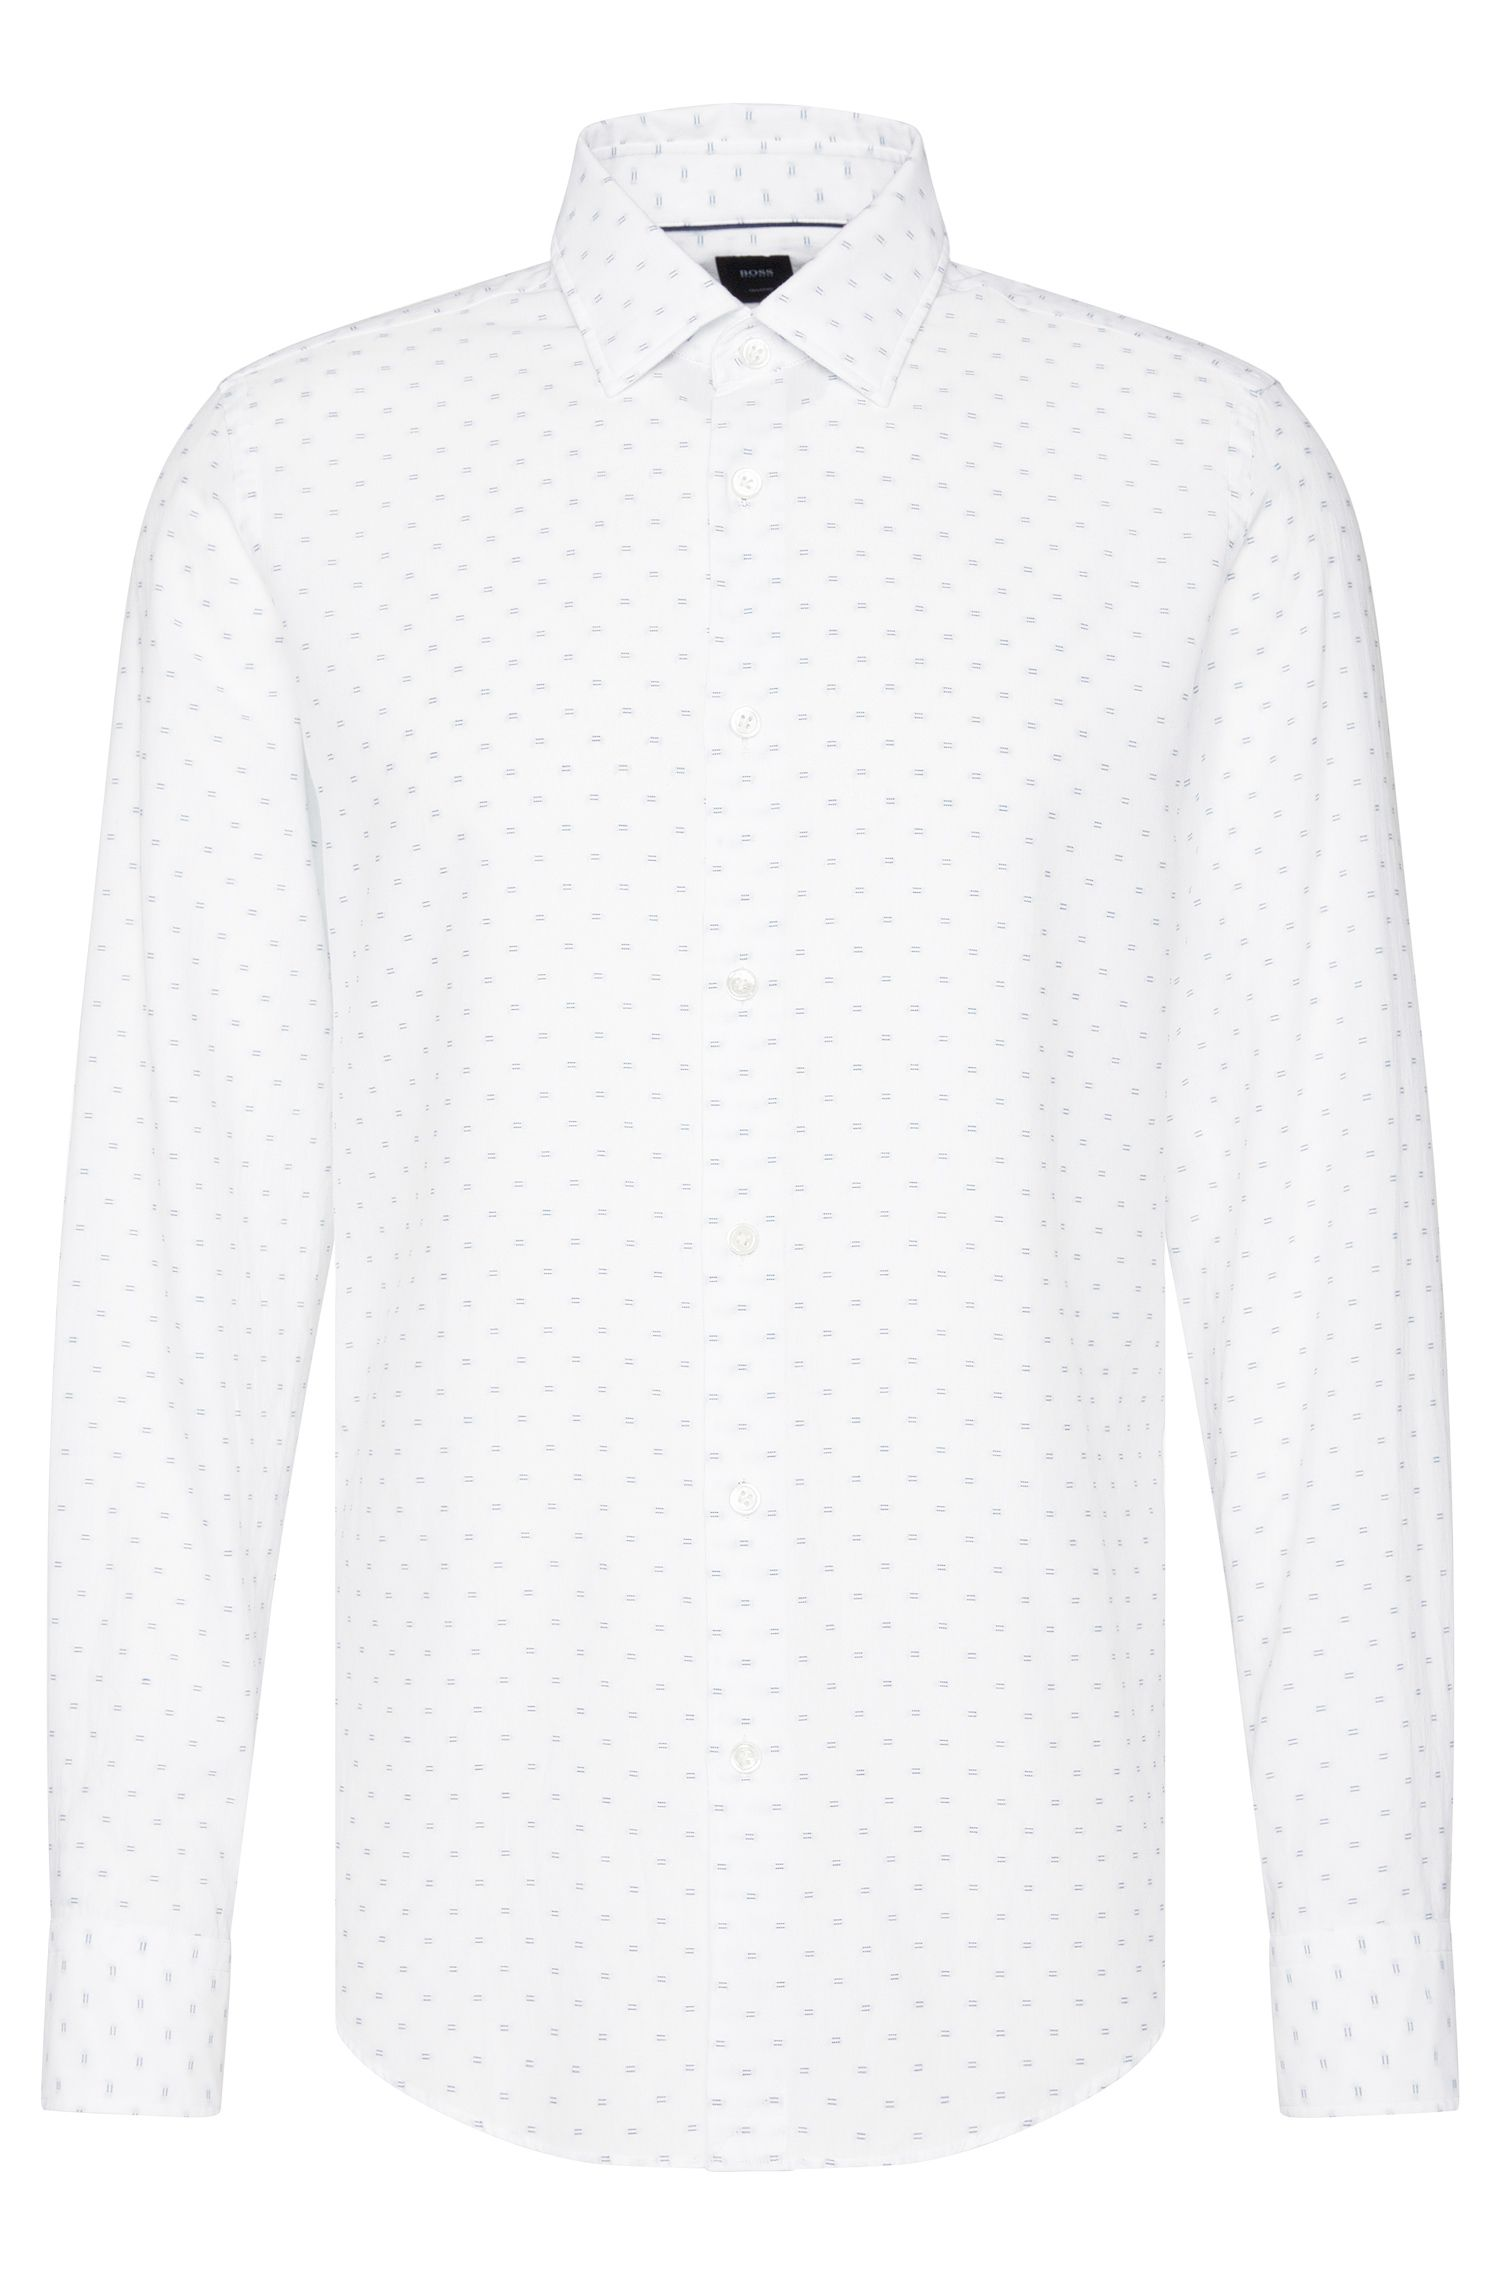 'T-Landon F' | Regular Fit, Italian Cotton Button Down Shirt